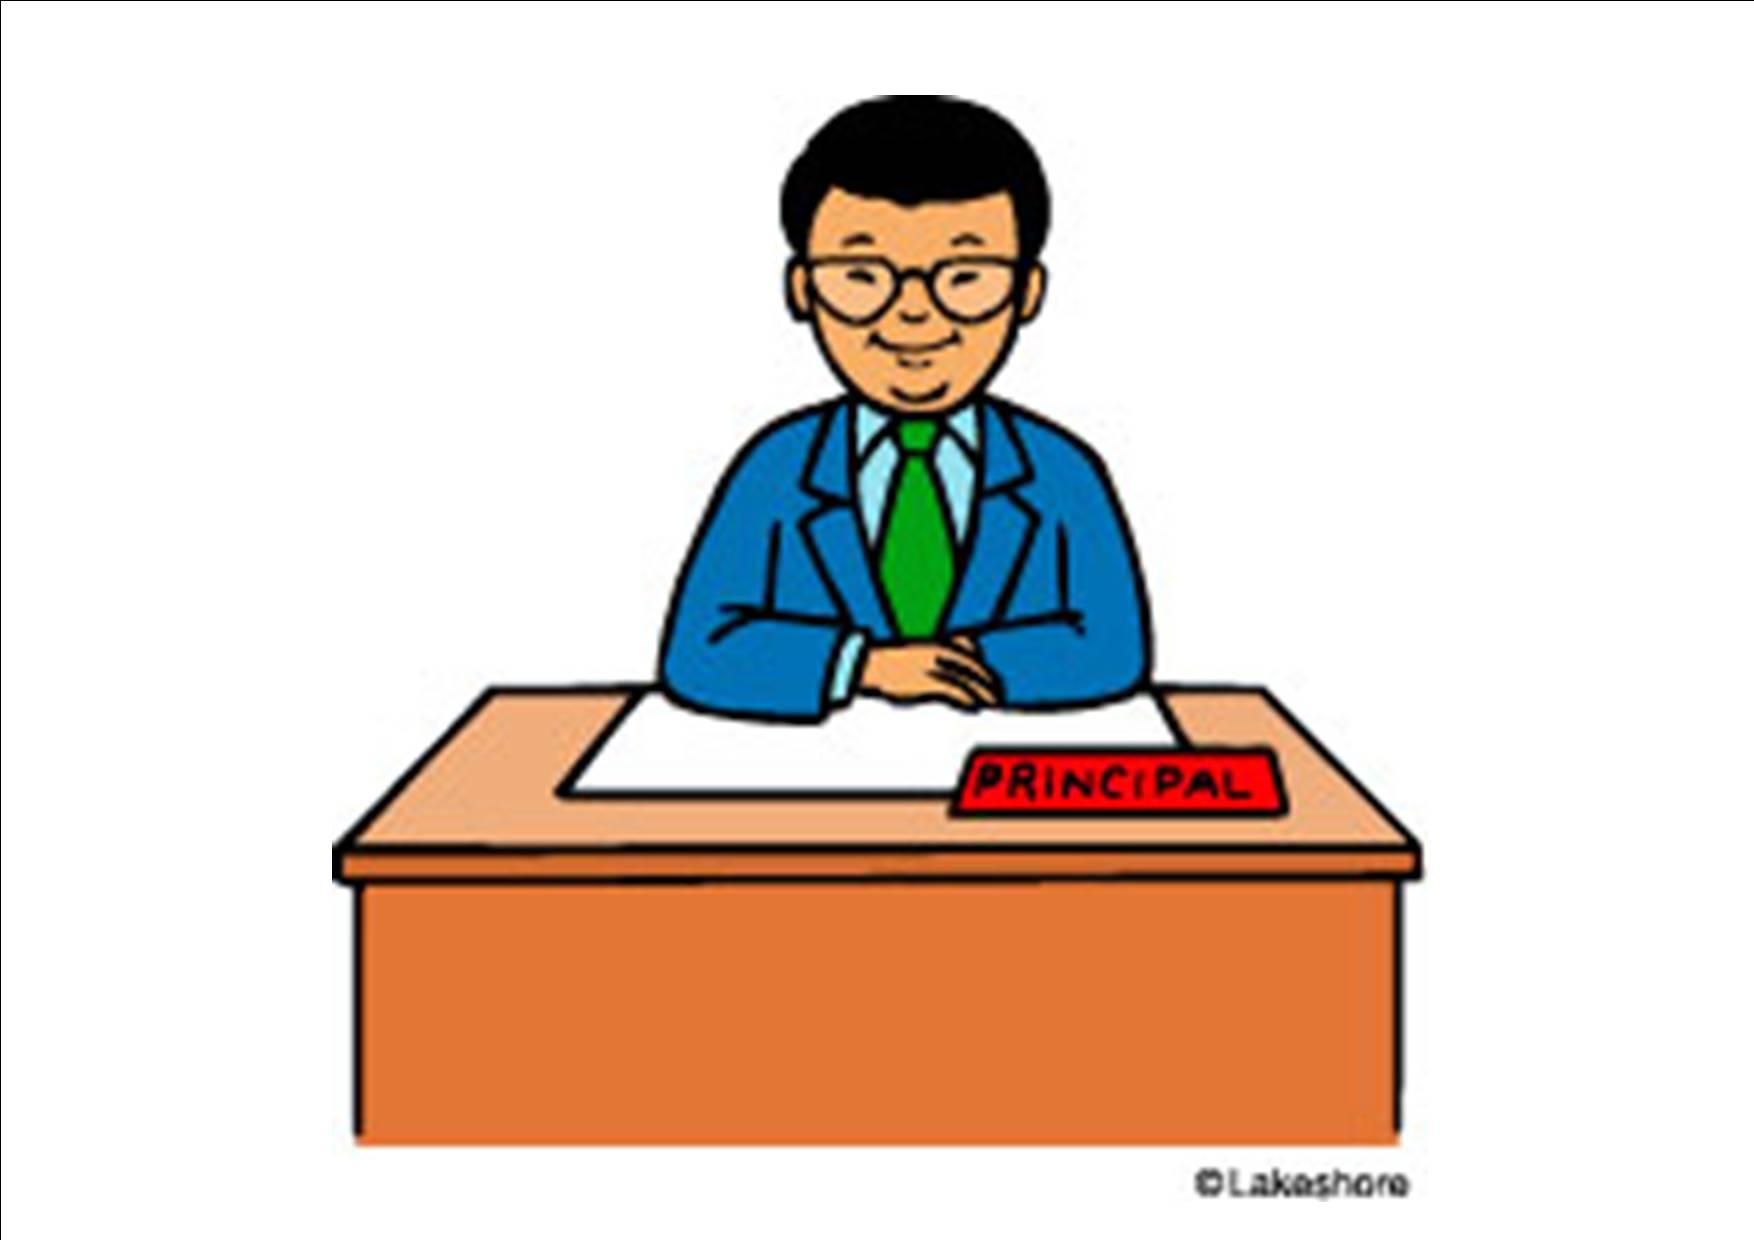 1754x1240 Journalist clipart female principal